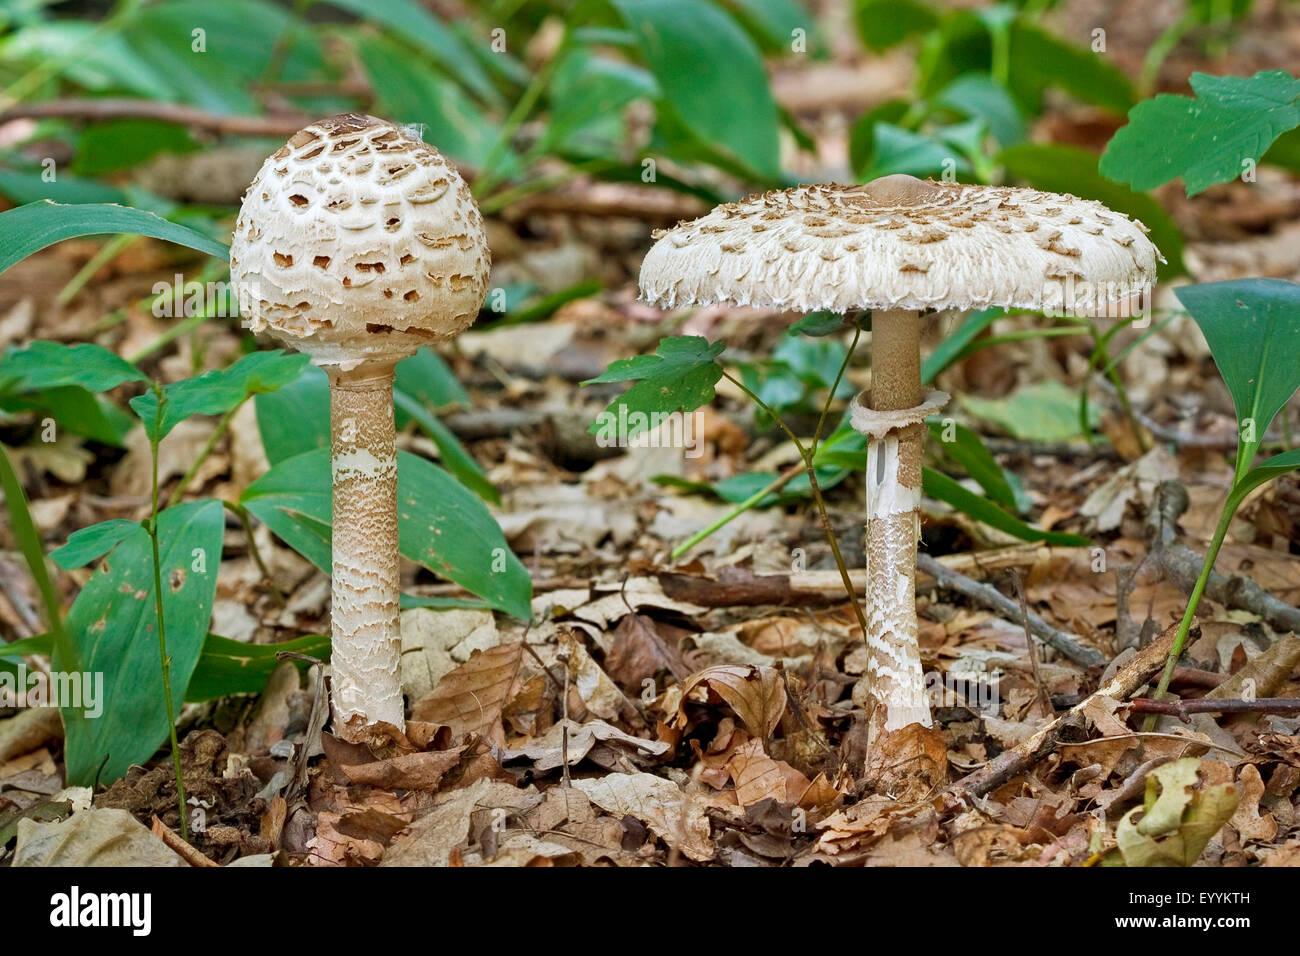 parasol (Macrolepiota procera, Lepiotia procera), two fruiting bodies on forest floor, Germany - Stock Image